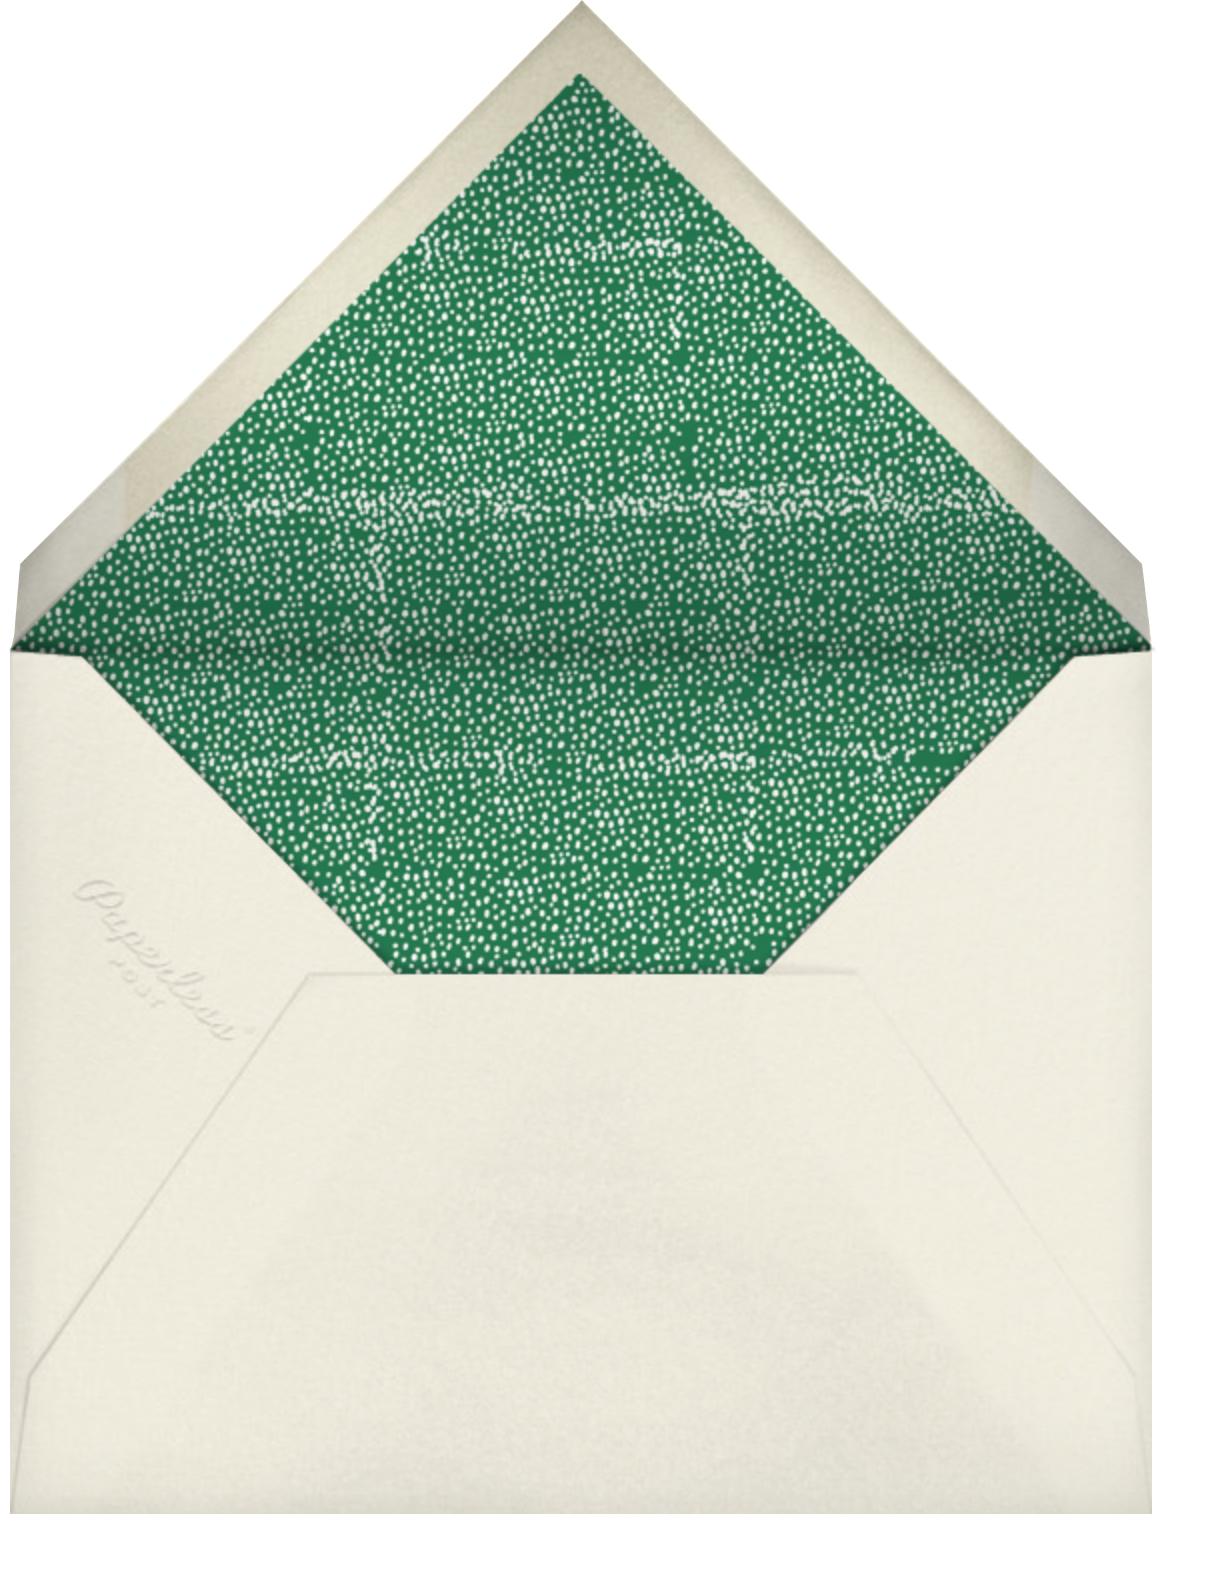 Foraged Frame - Greeting - Mr. Boddington's Studio - Envelope